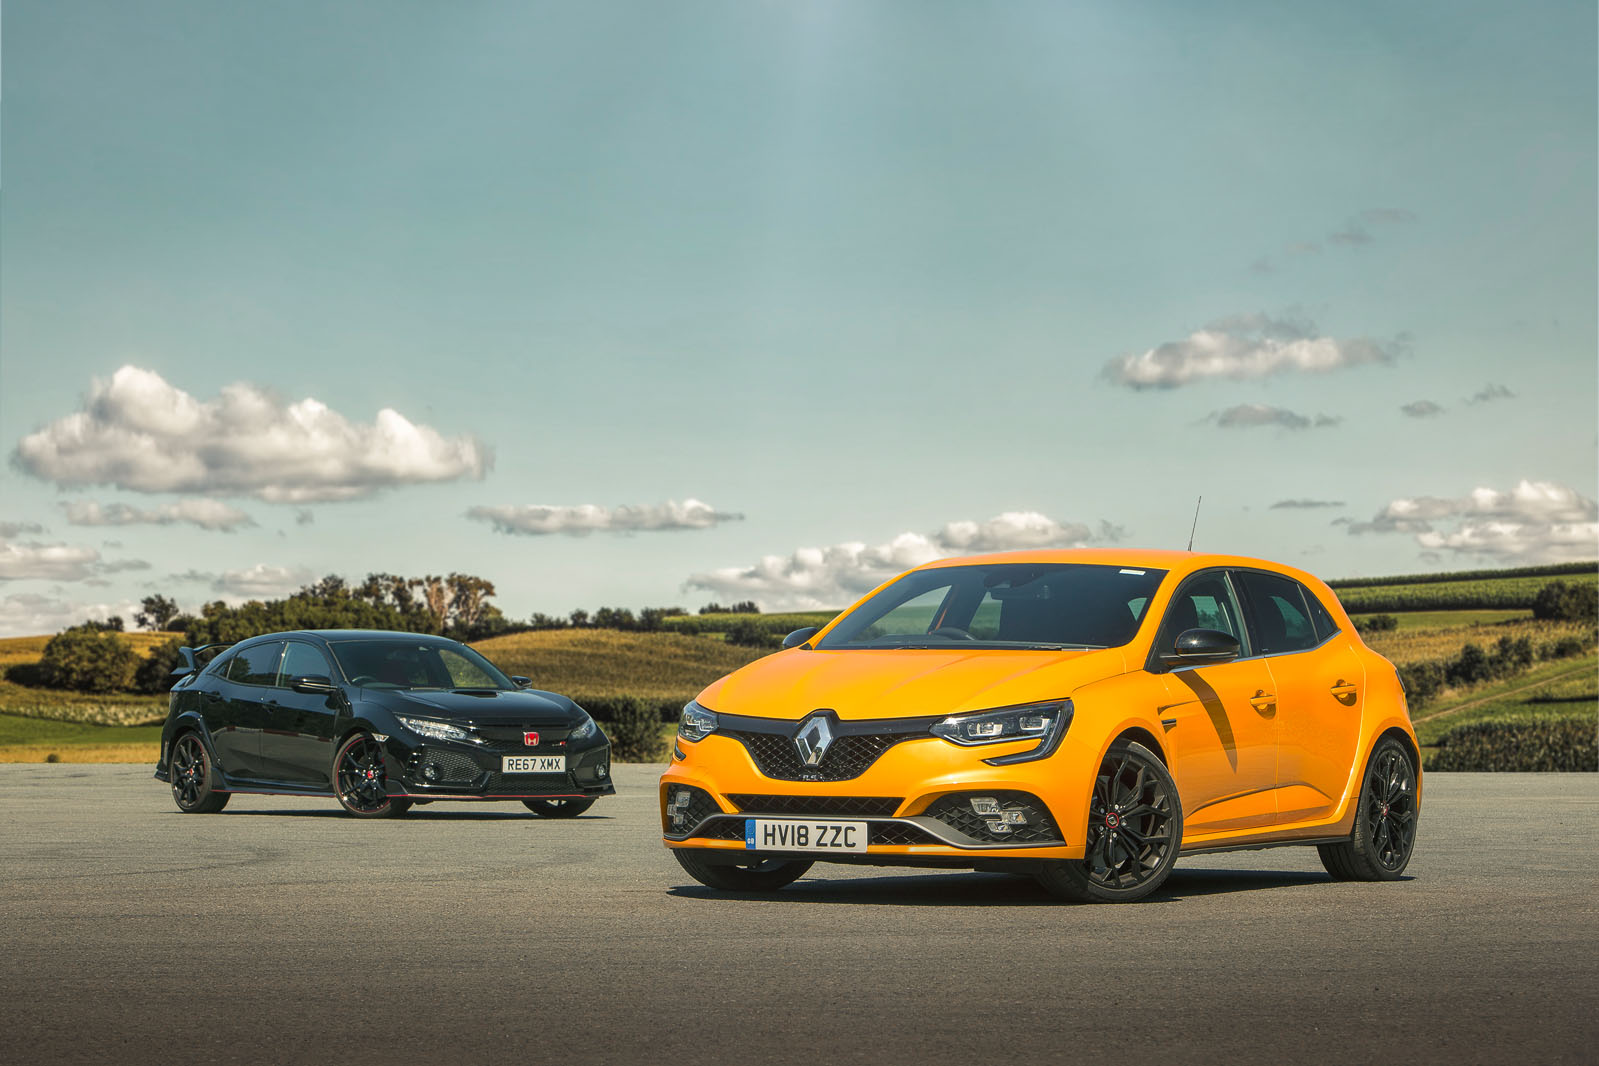 Hot hatch showdown: Renault Megane RS vs Honda Civic Type R | Autocar